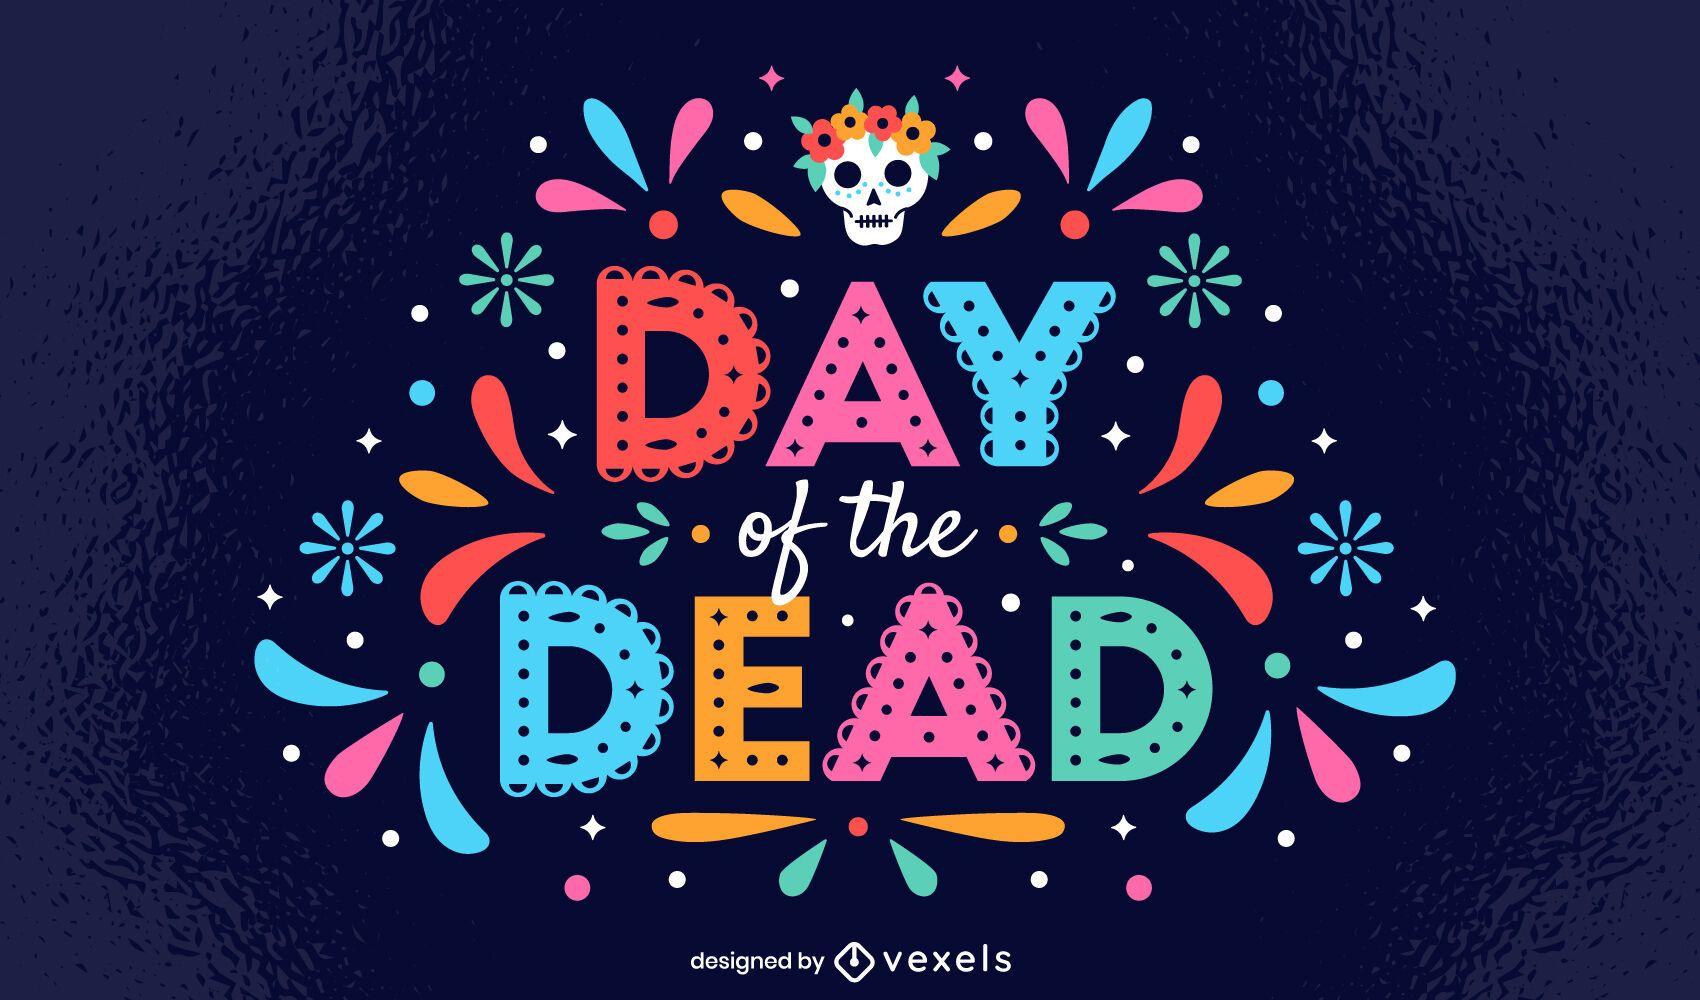 Tag der Toten Papel Picado Schriftzug